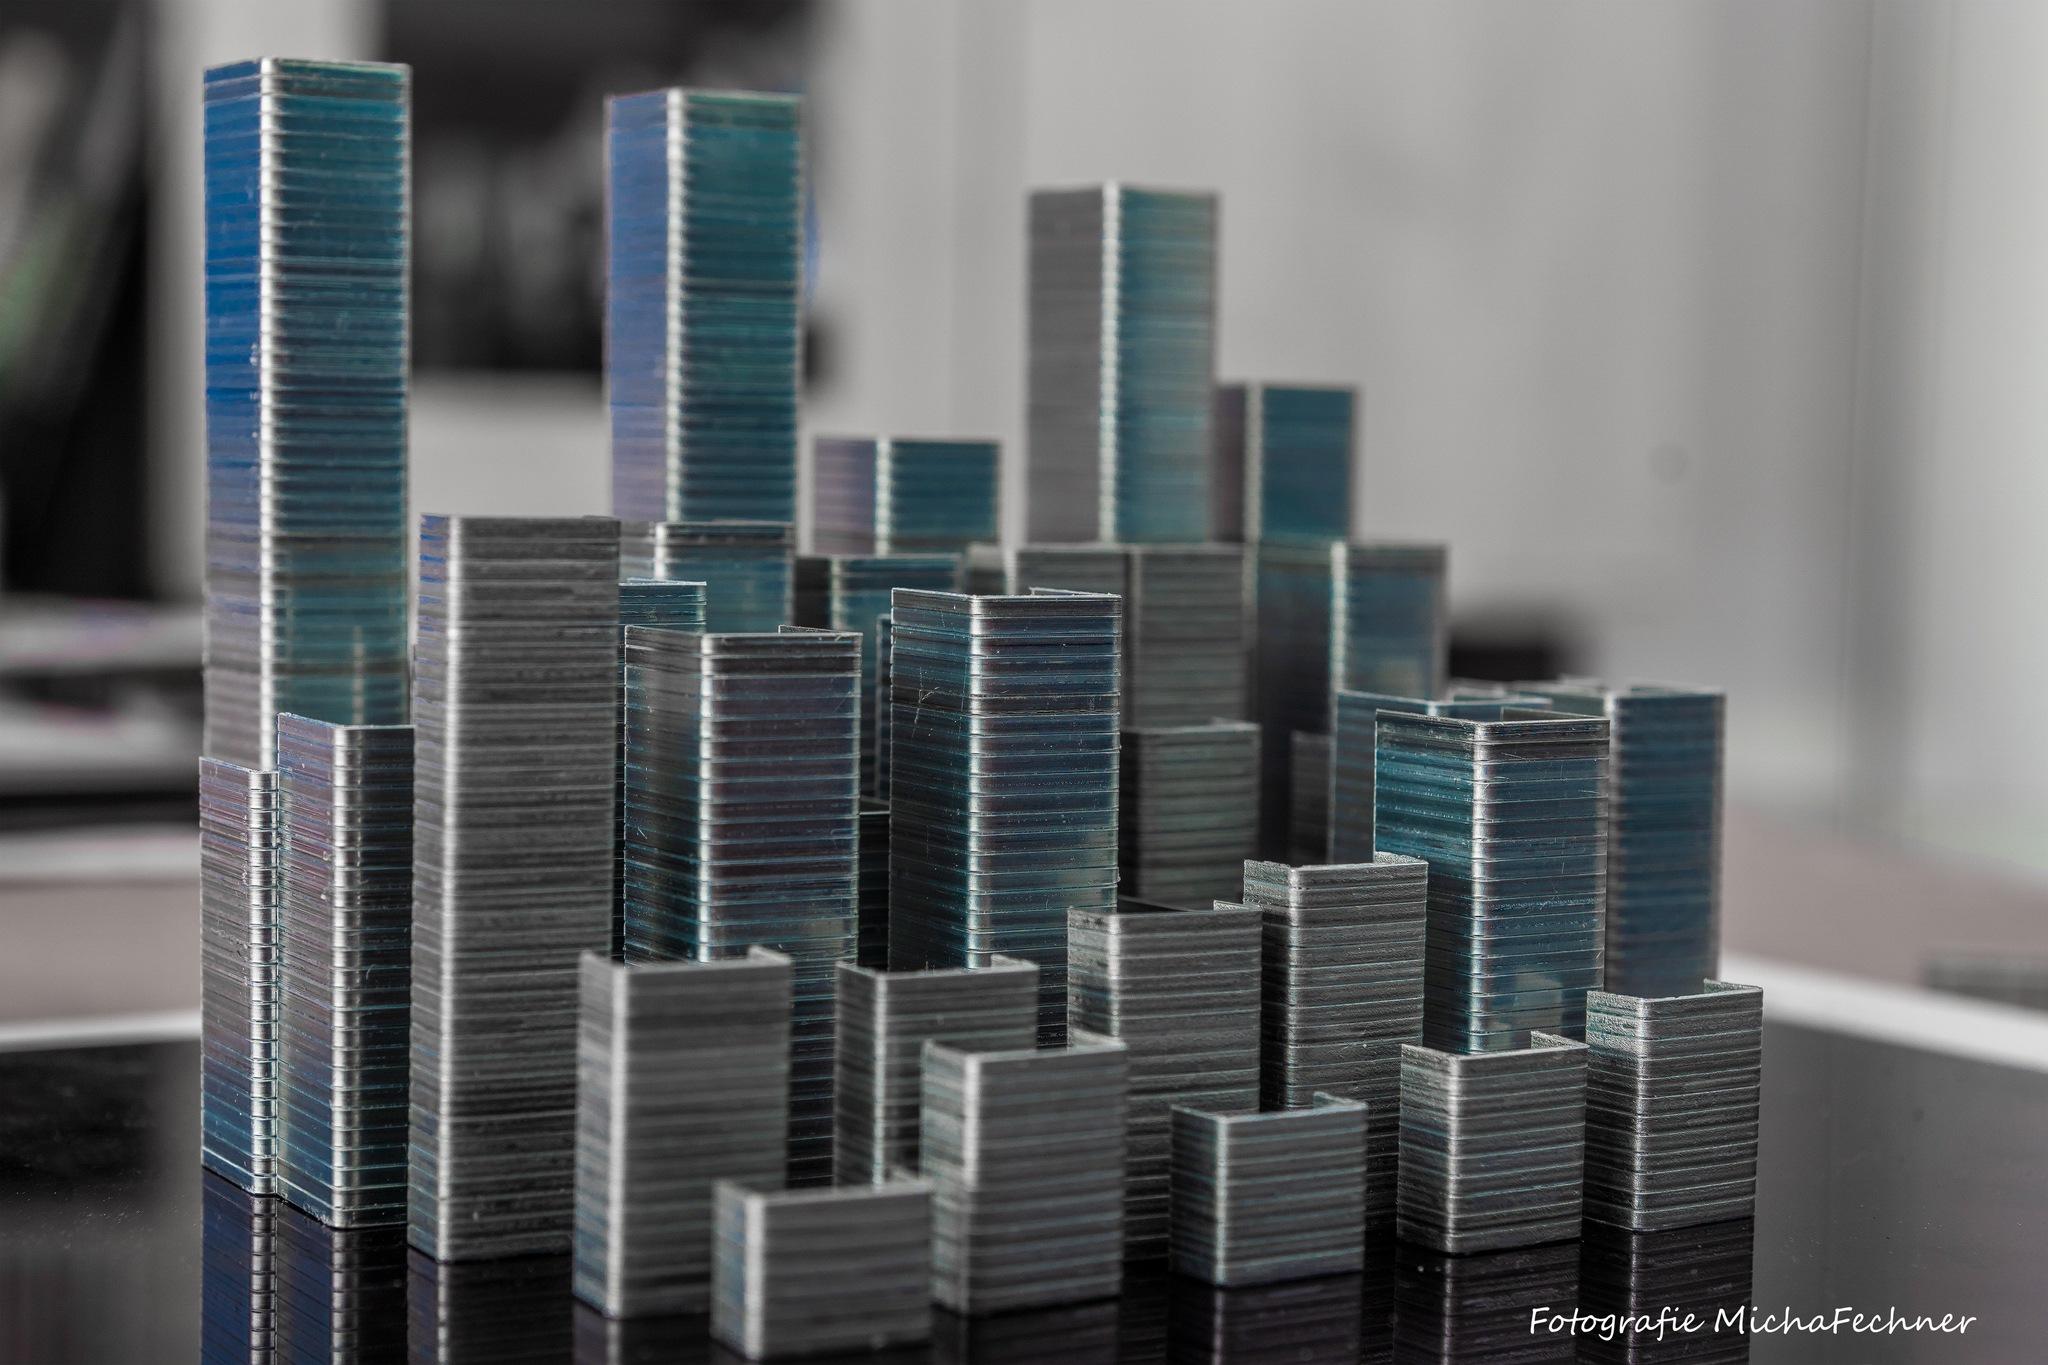 Cityline by micha.fechner